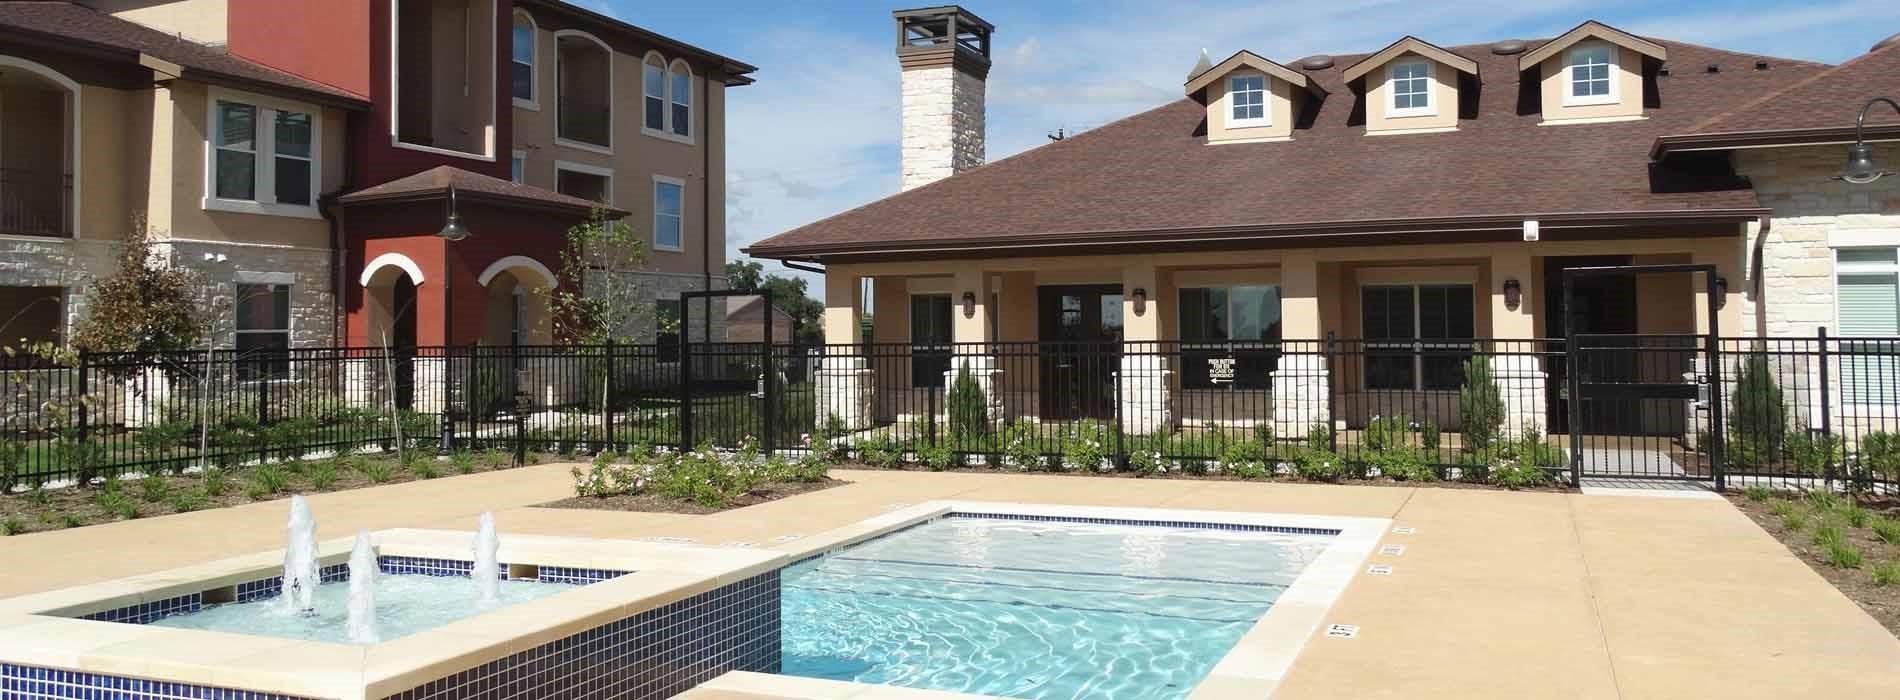 Highland Villas   Bryan, TX   (979) 703-5165